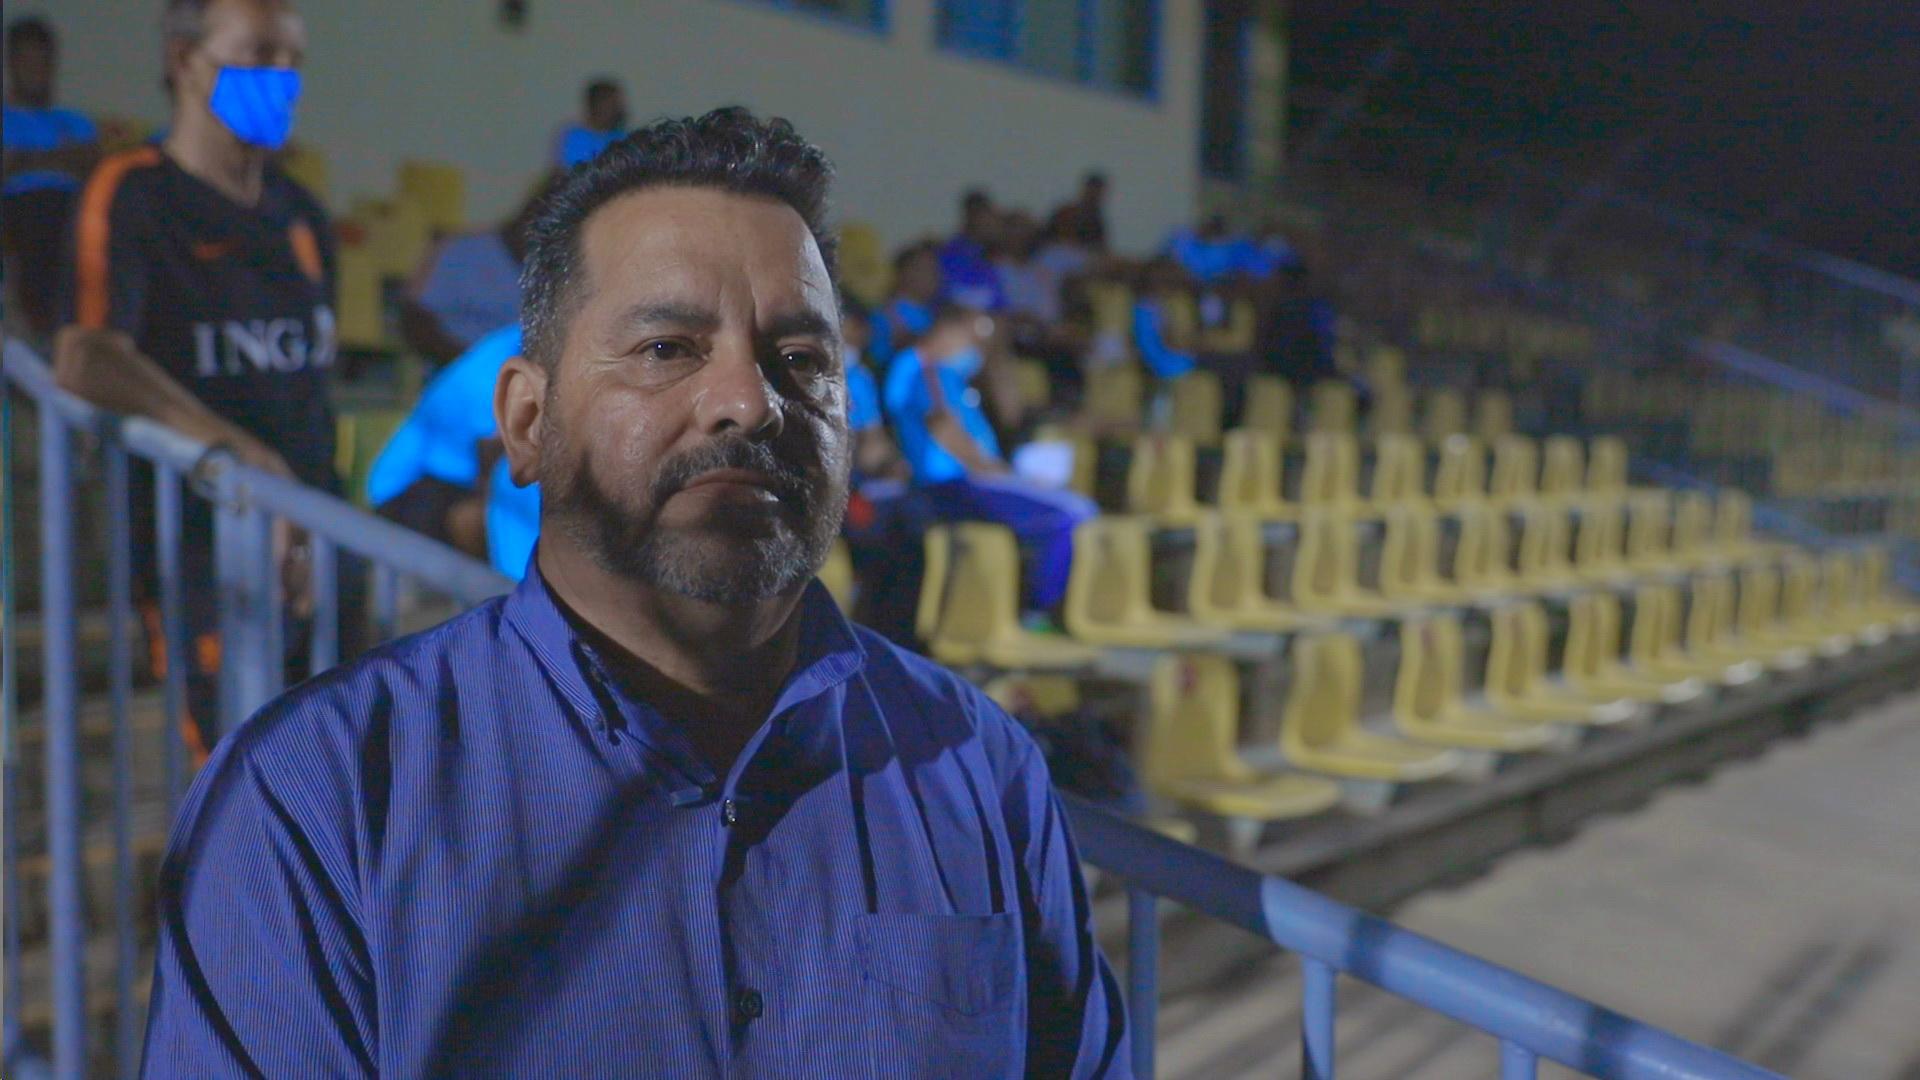 AVB: Diesocho coach participante den curso di B-License